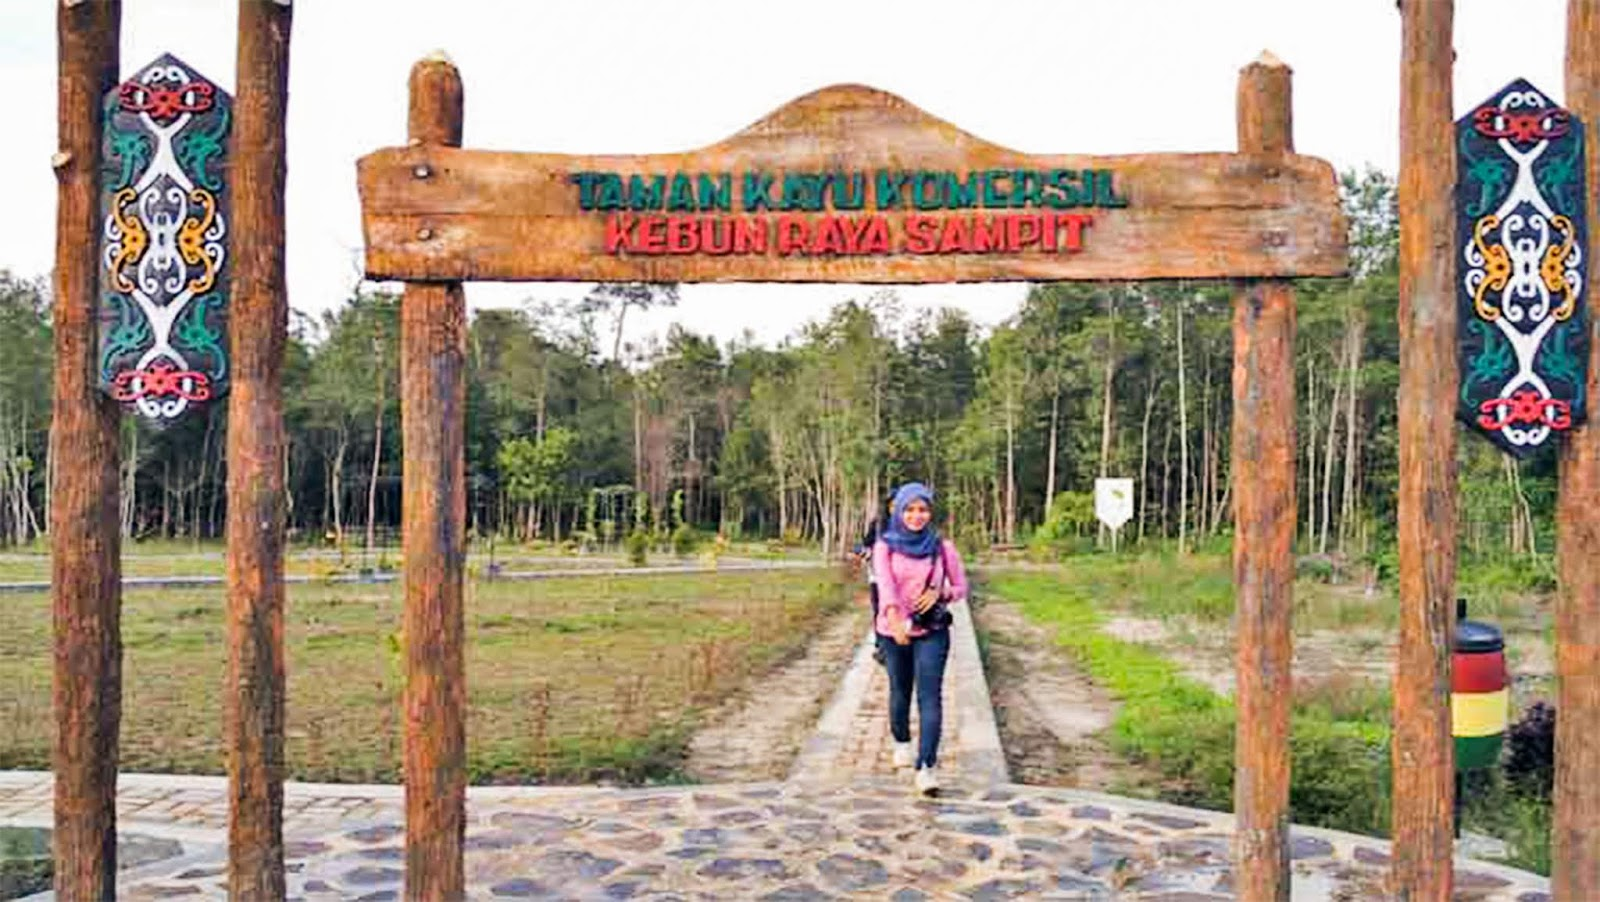 Kawasan wisata Kebun Raya Sampit  Sangkay City